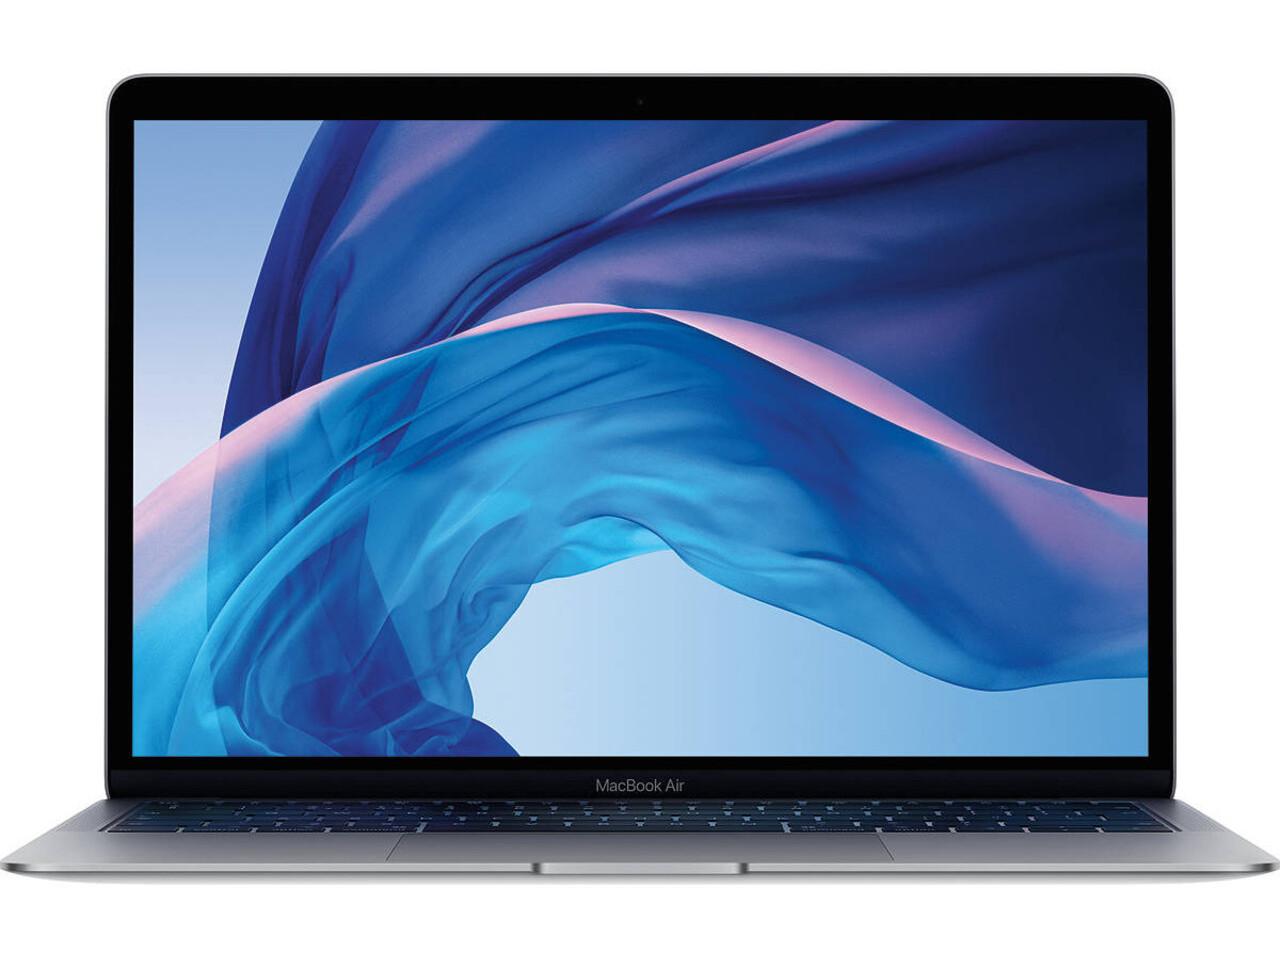 macbook air 13 inch 2019 space gray